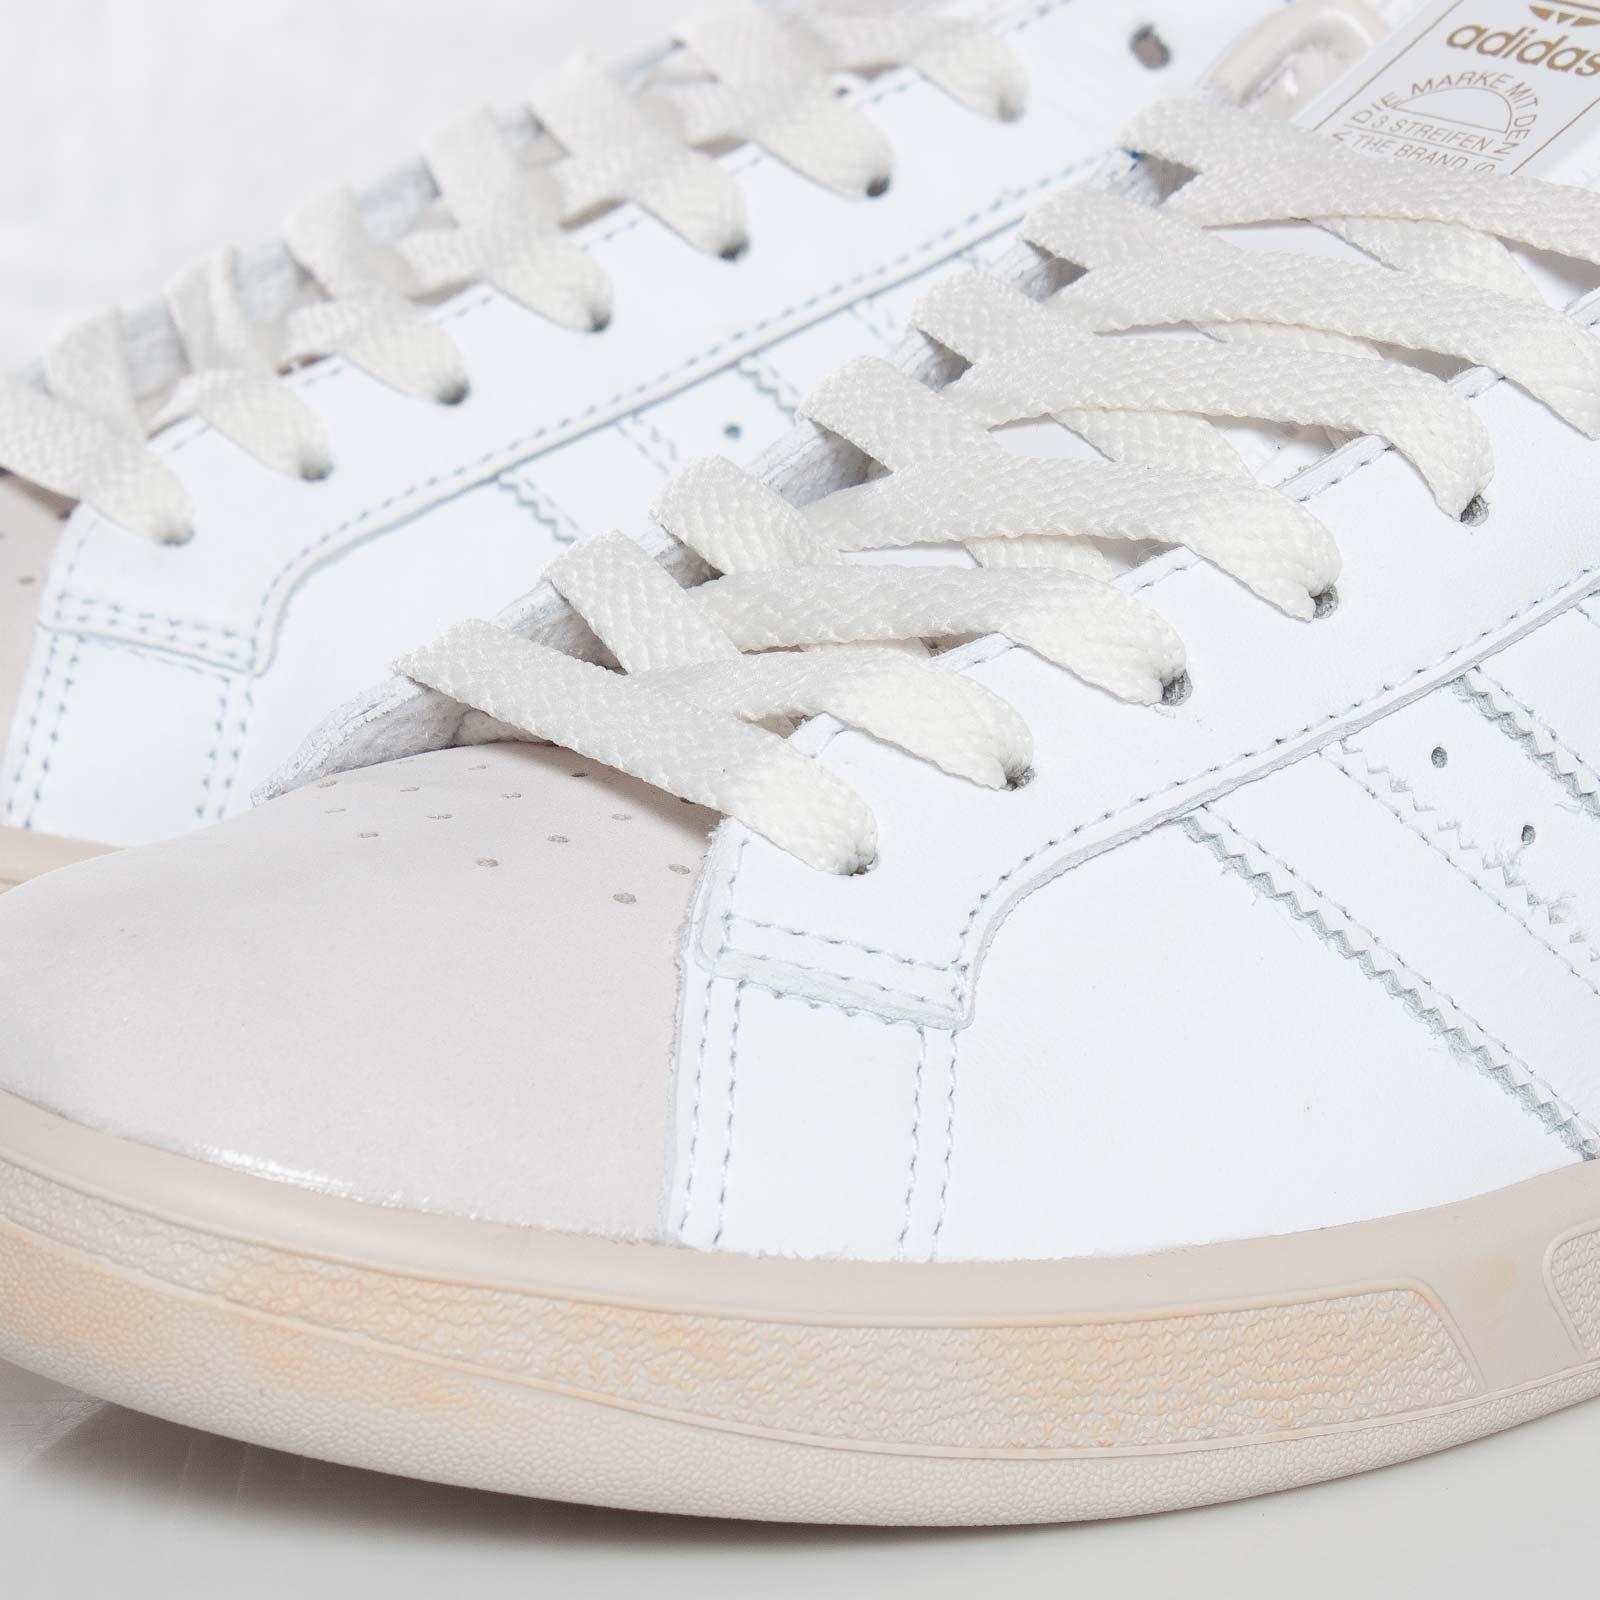 adidas Grand Prix Q20445 Sneakersnstuff   sneakers